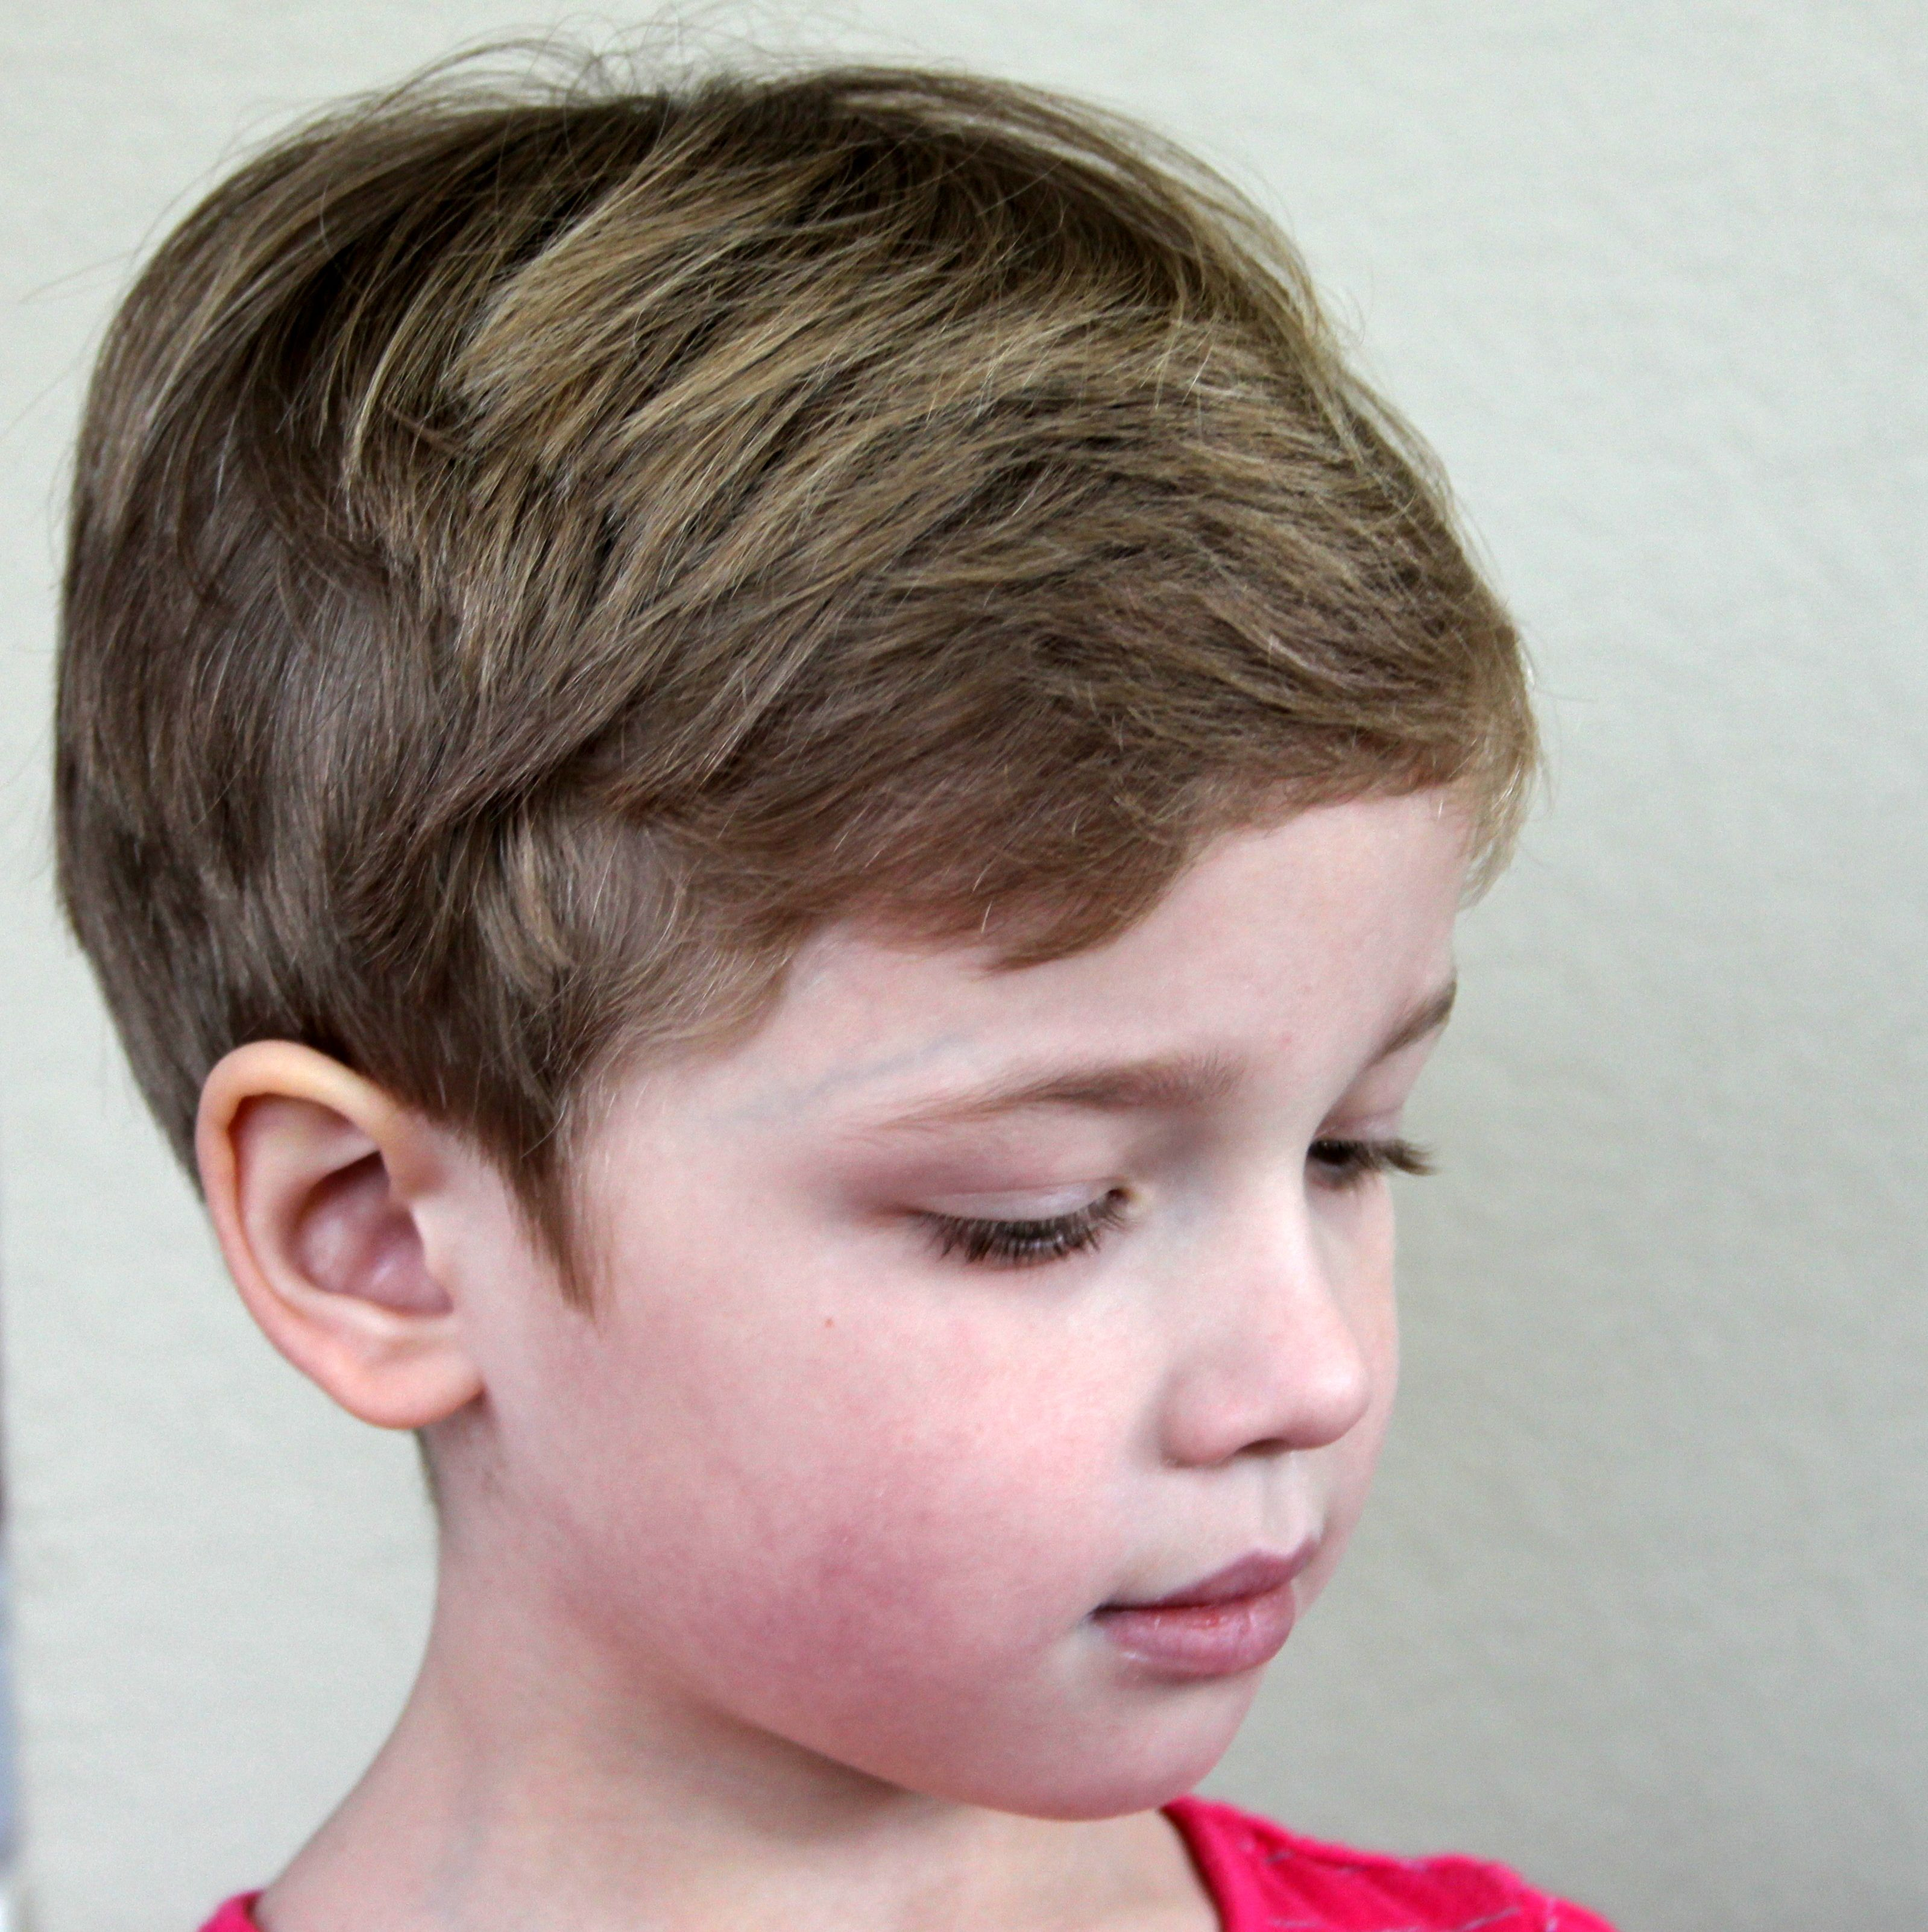 Pixie hair on a five year old short hair pinterest pixie hair